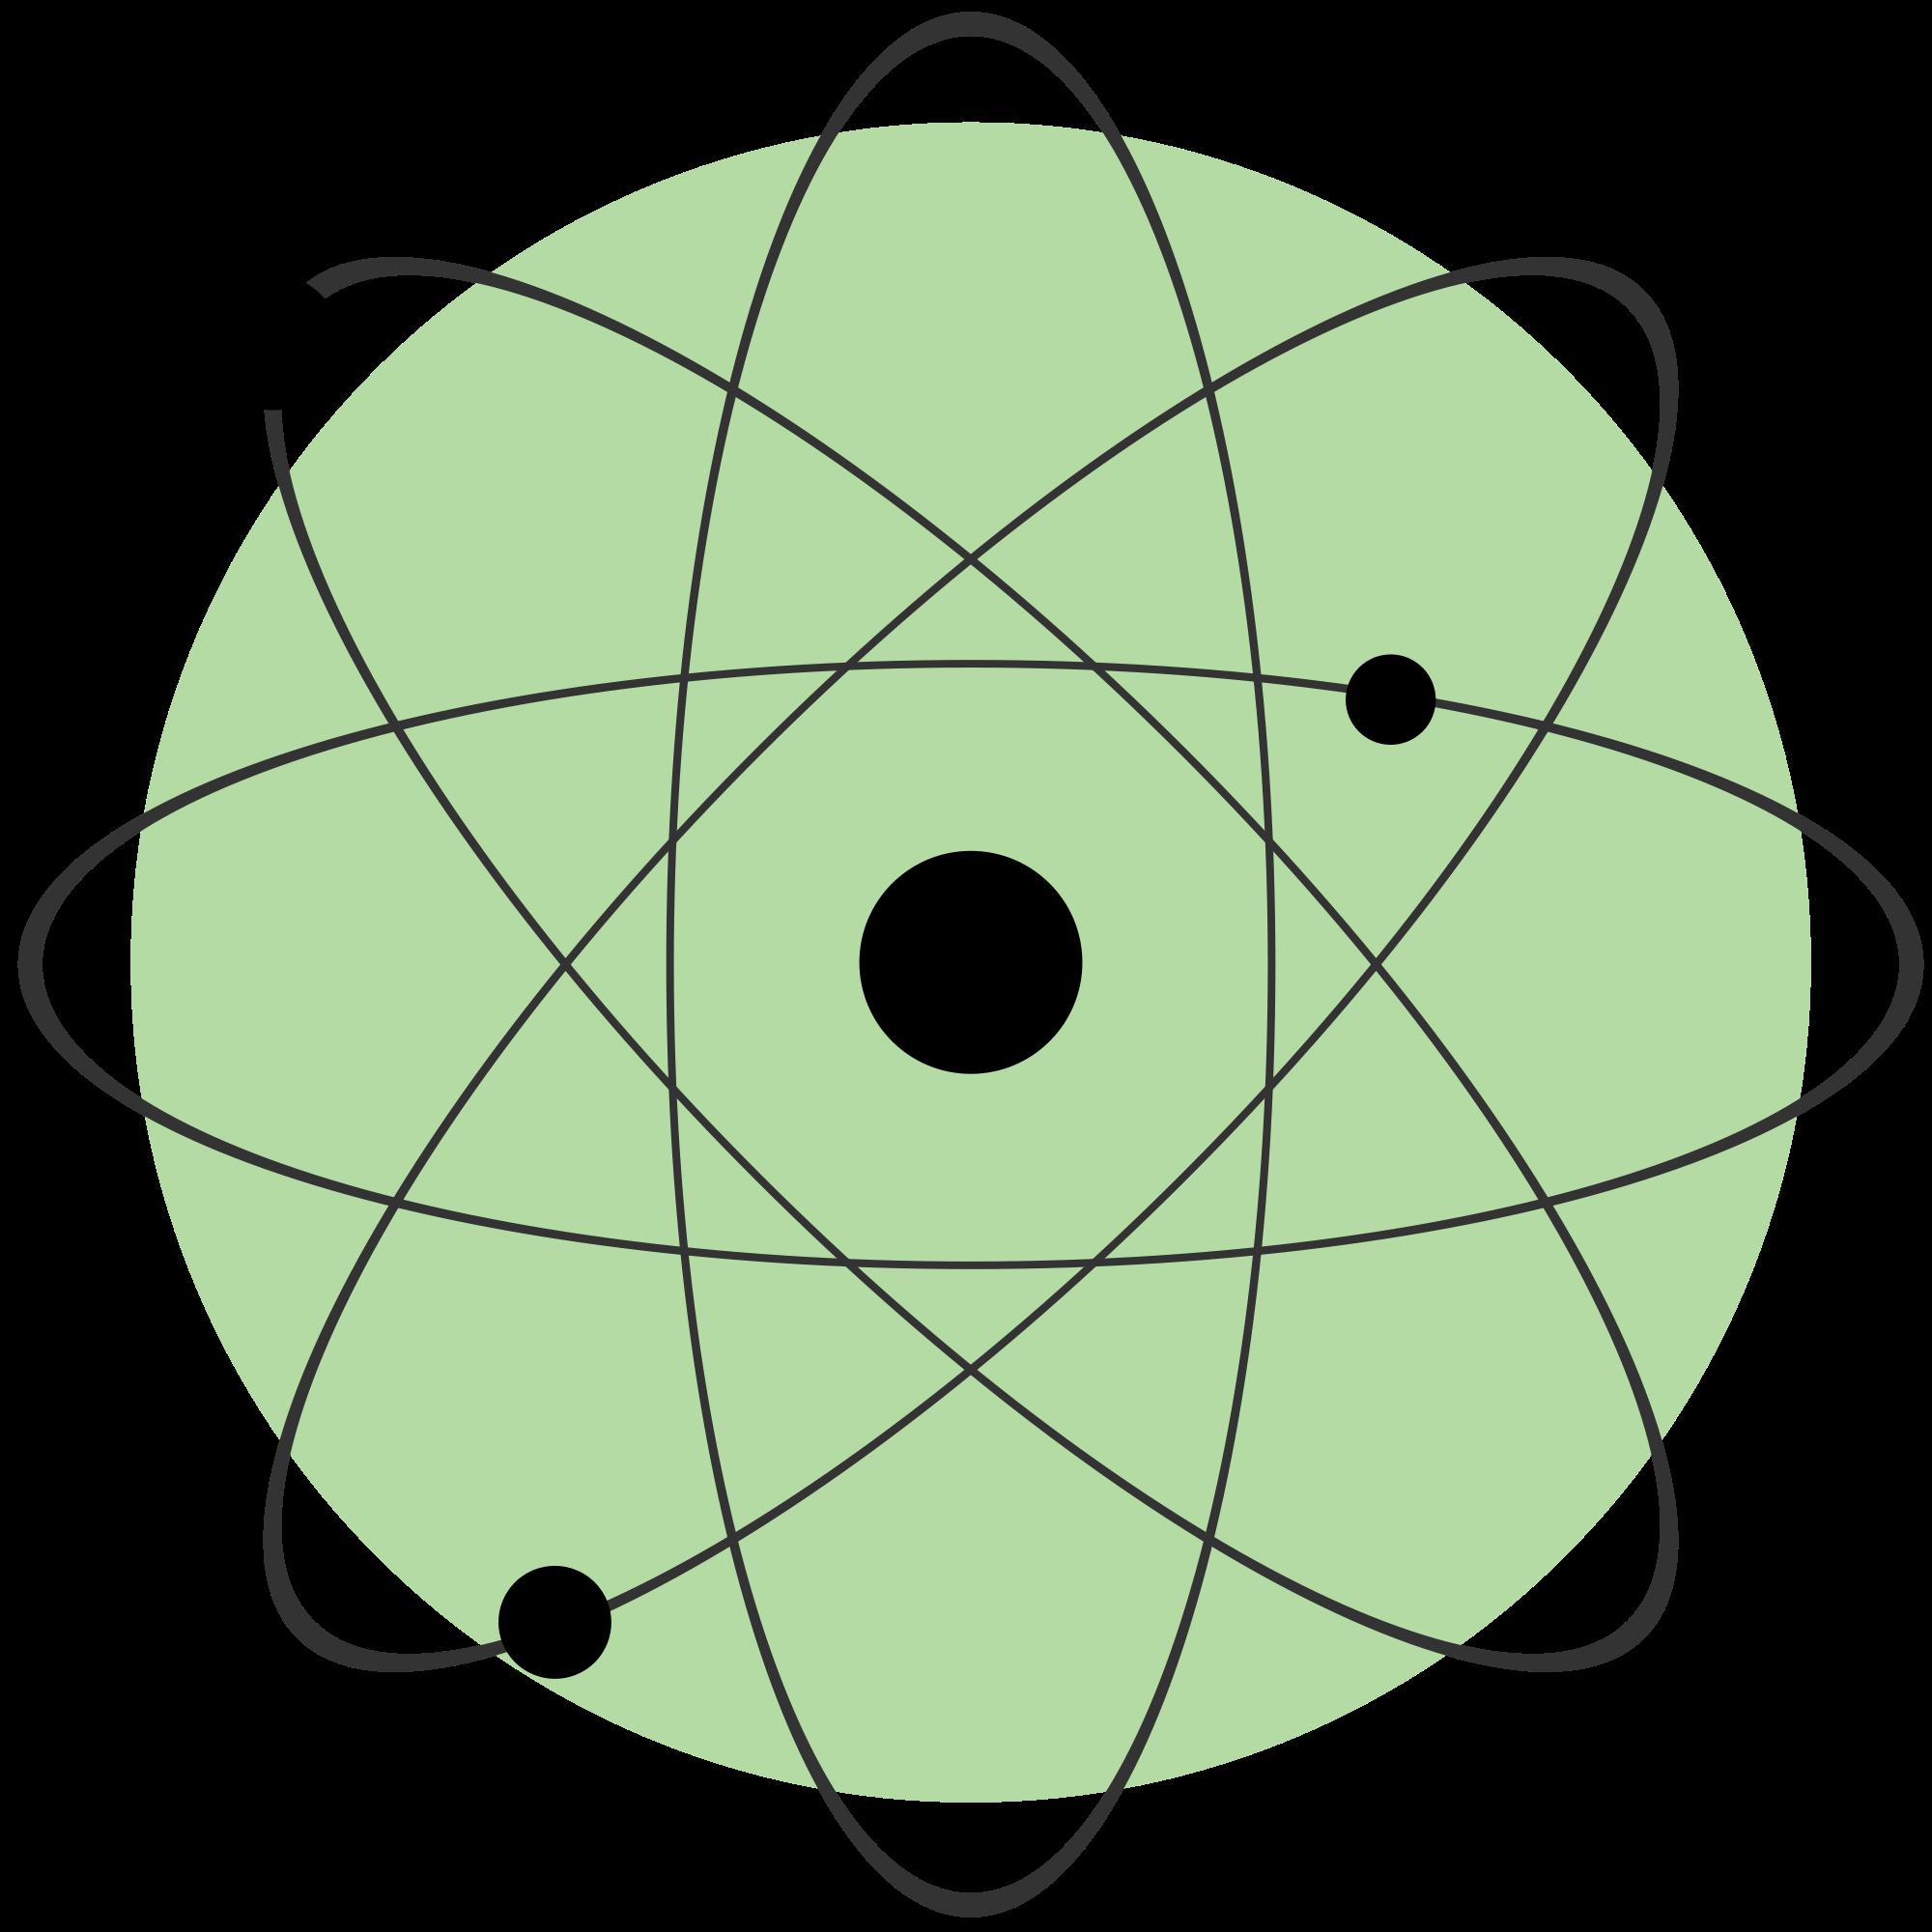 Atomic svg #11, Download drawings